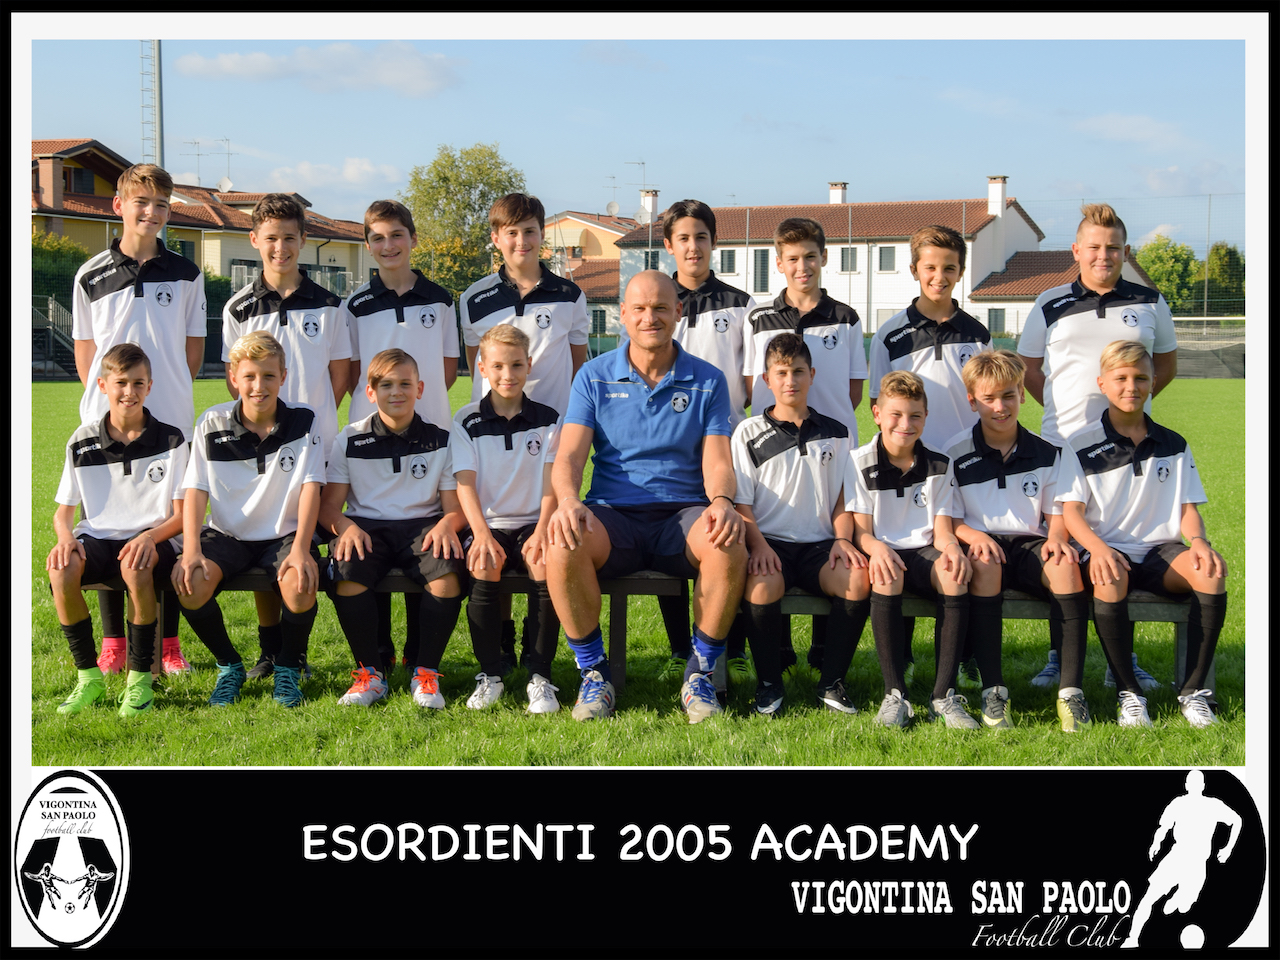 2005 Esordienti Academy - Carisi